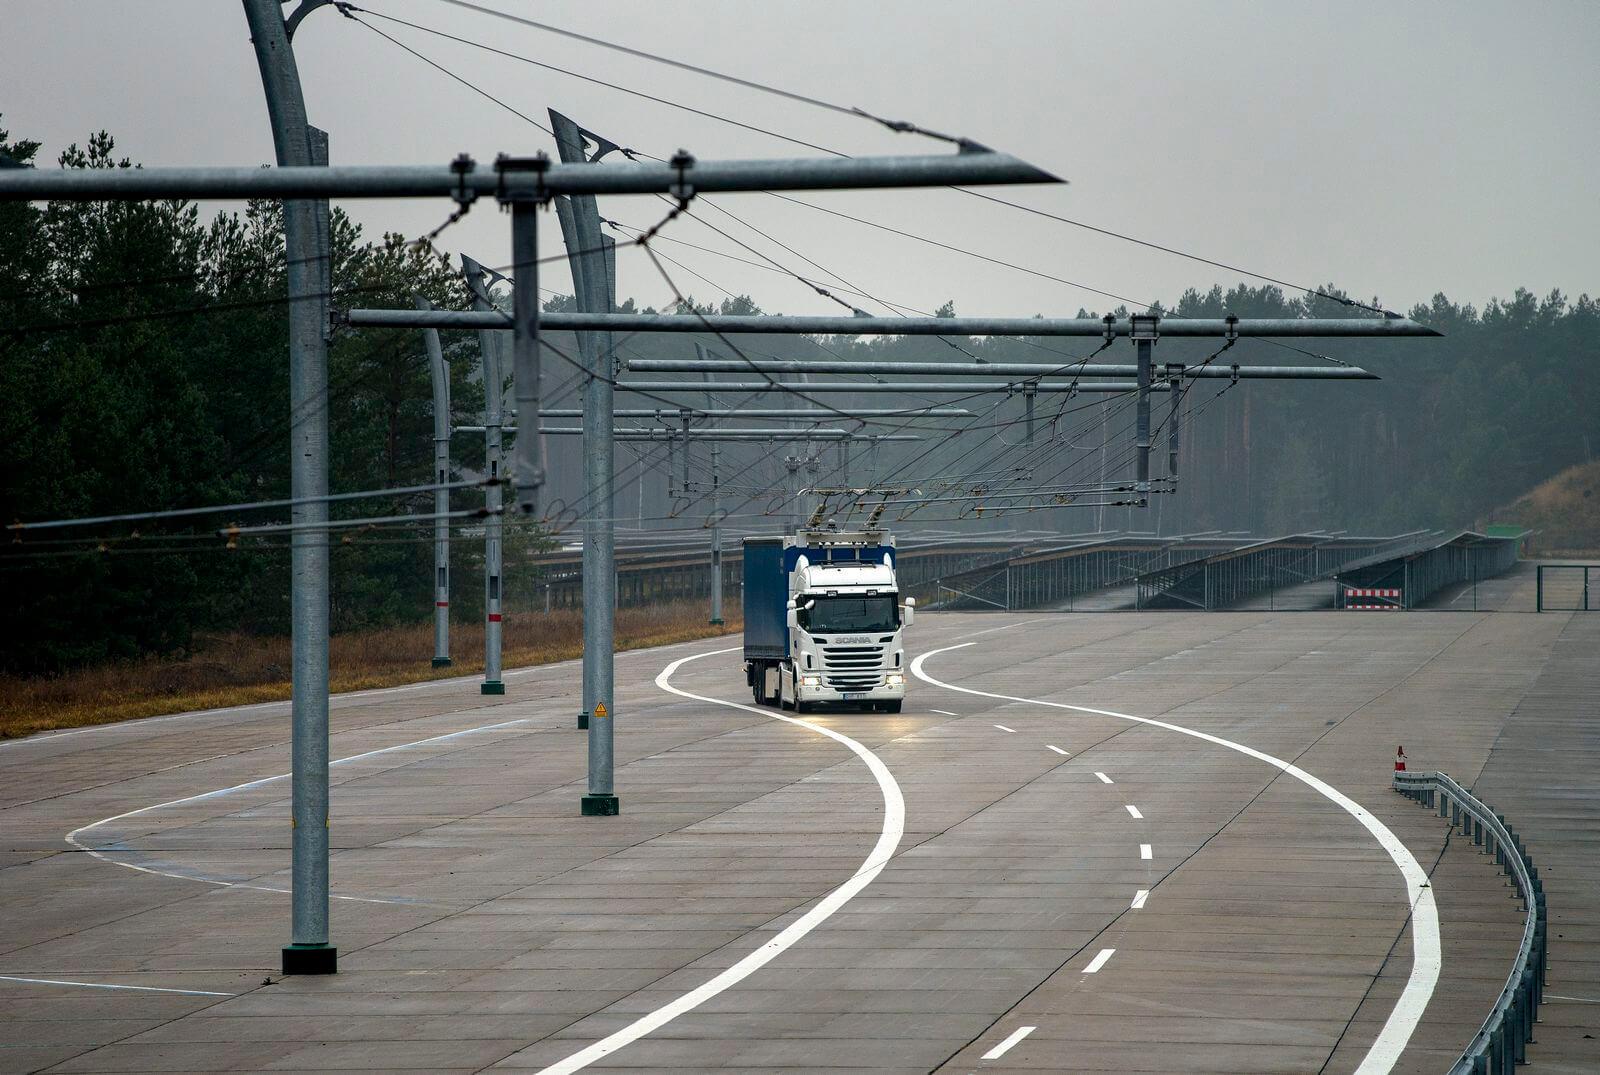 Commercial trolley trucks